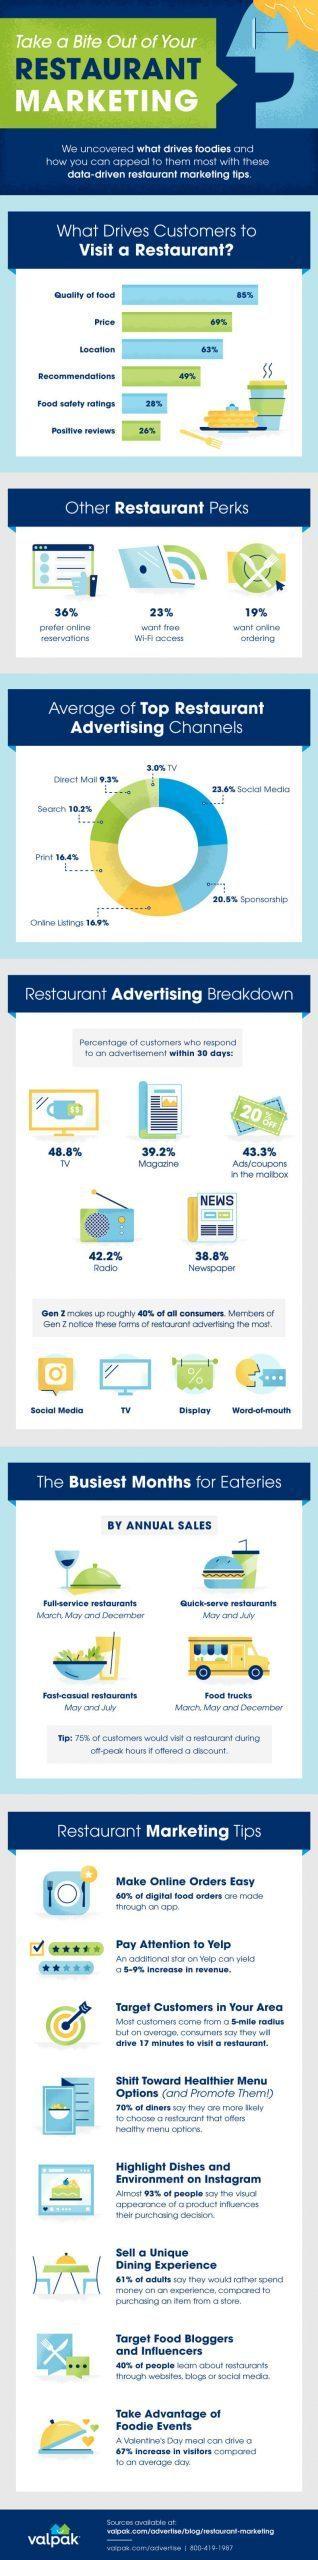 restaurant marketing infographic updated